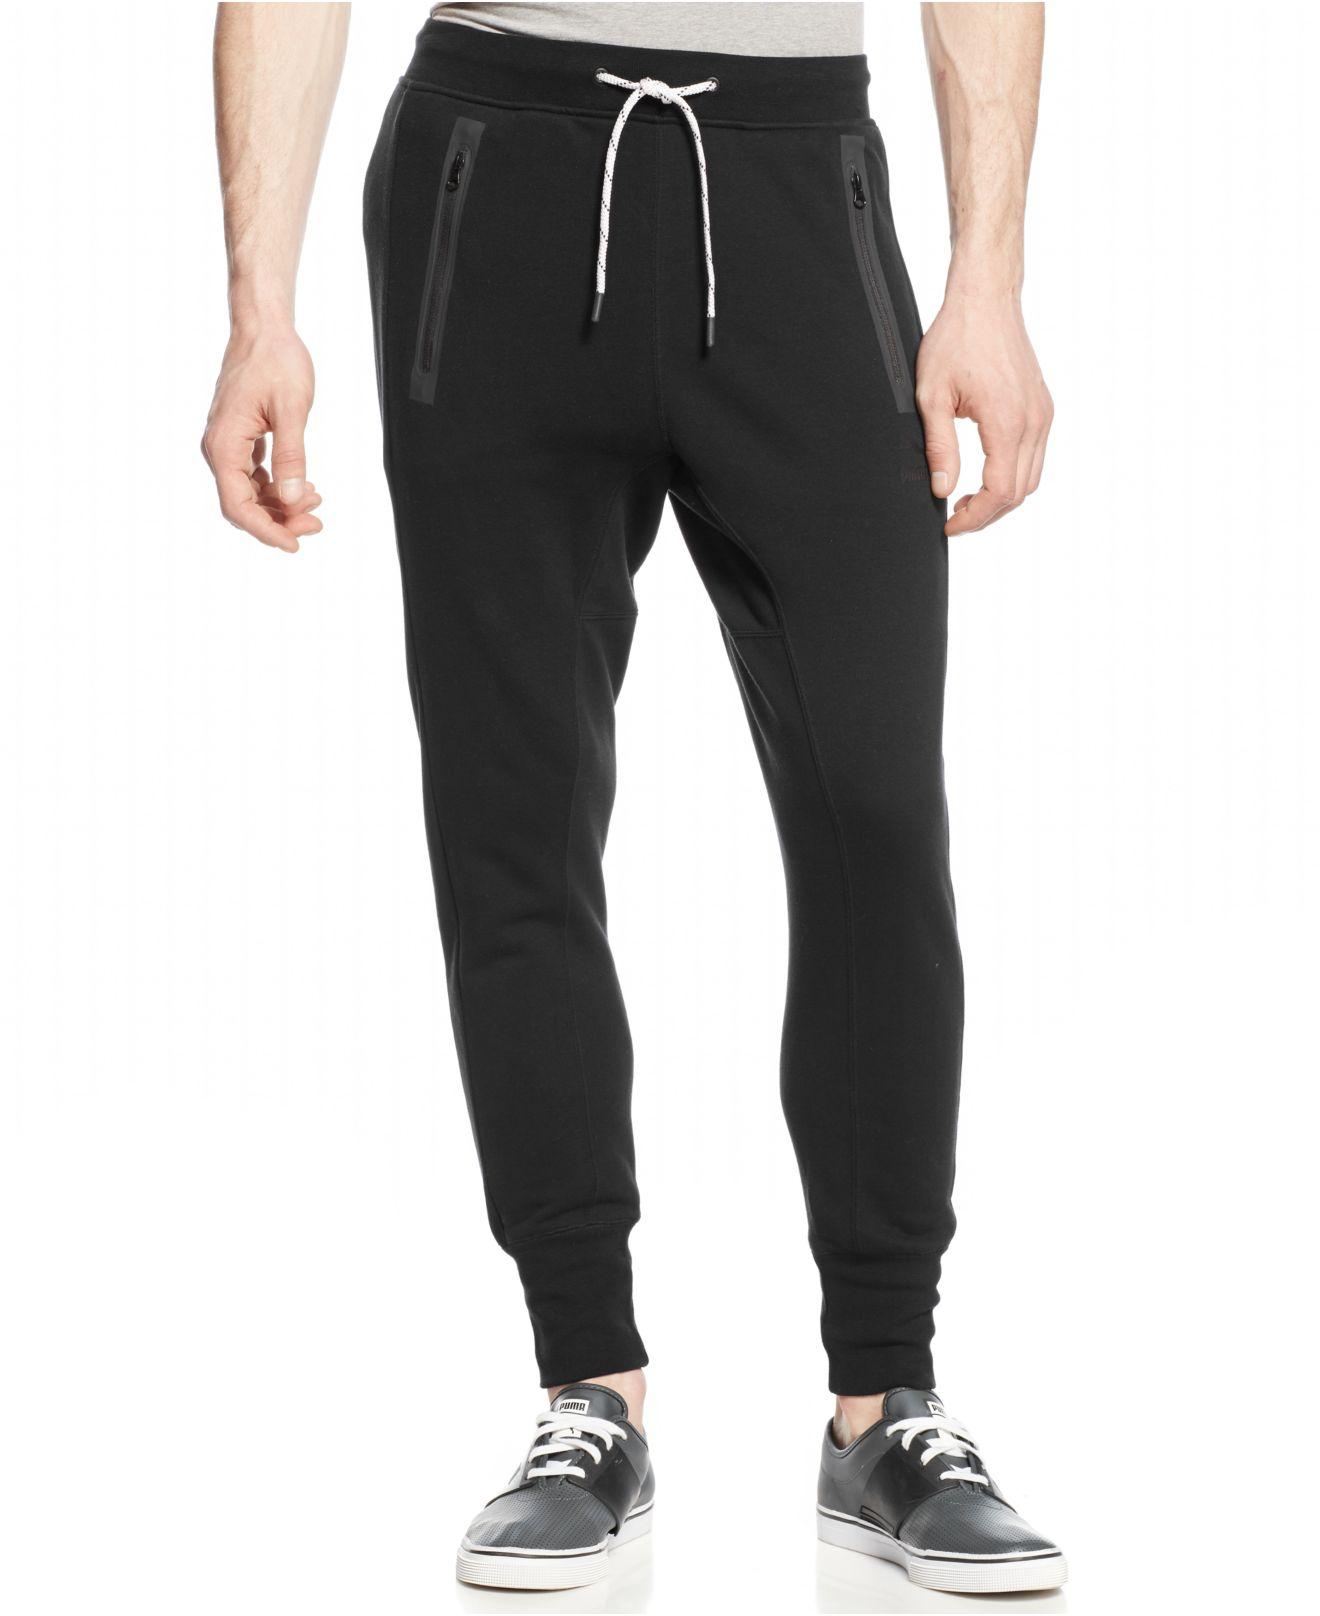 Puma Men/'s Essential Active Woven Pants Cl Pants Sweatpants Drycell 851707